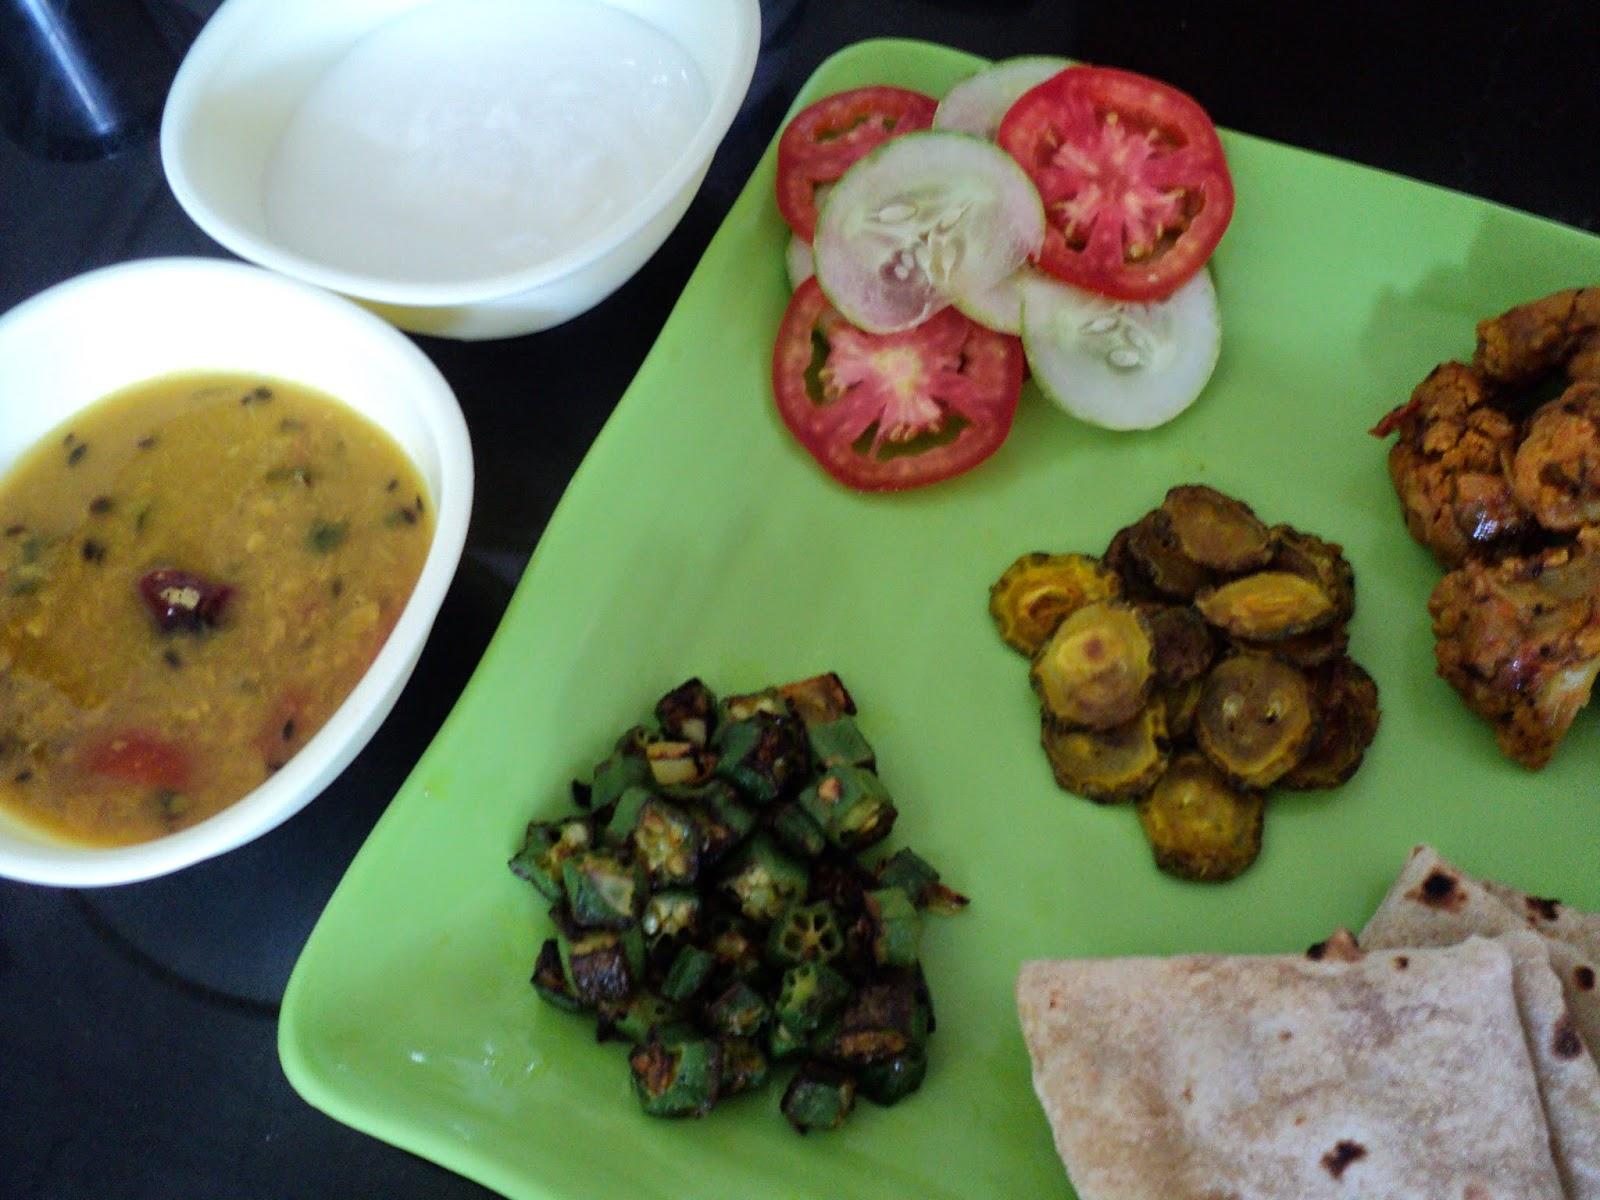 Oriyarasoi the cosmopolitan odias kitchen oriya thali for oriya thali for diabeticshigh bp detox mondays forumfinder Image collections